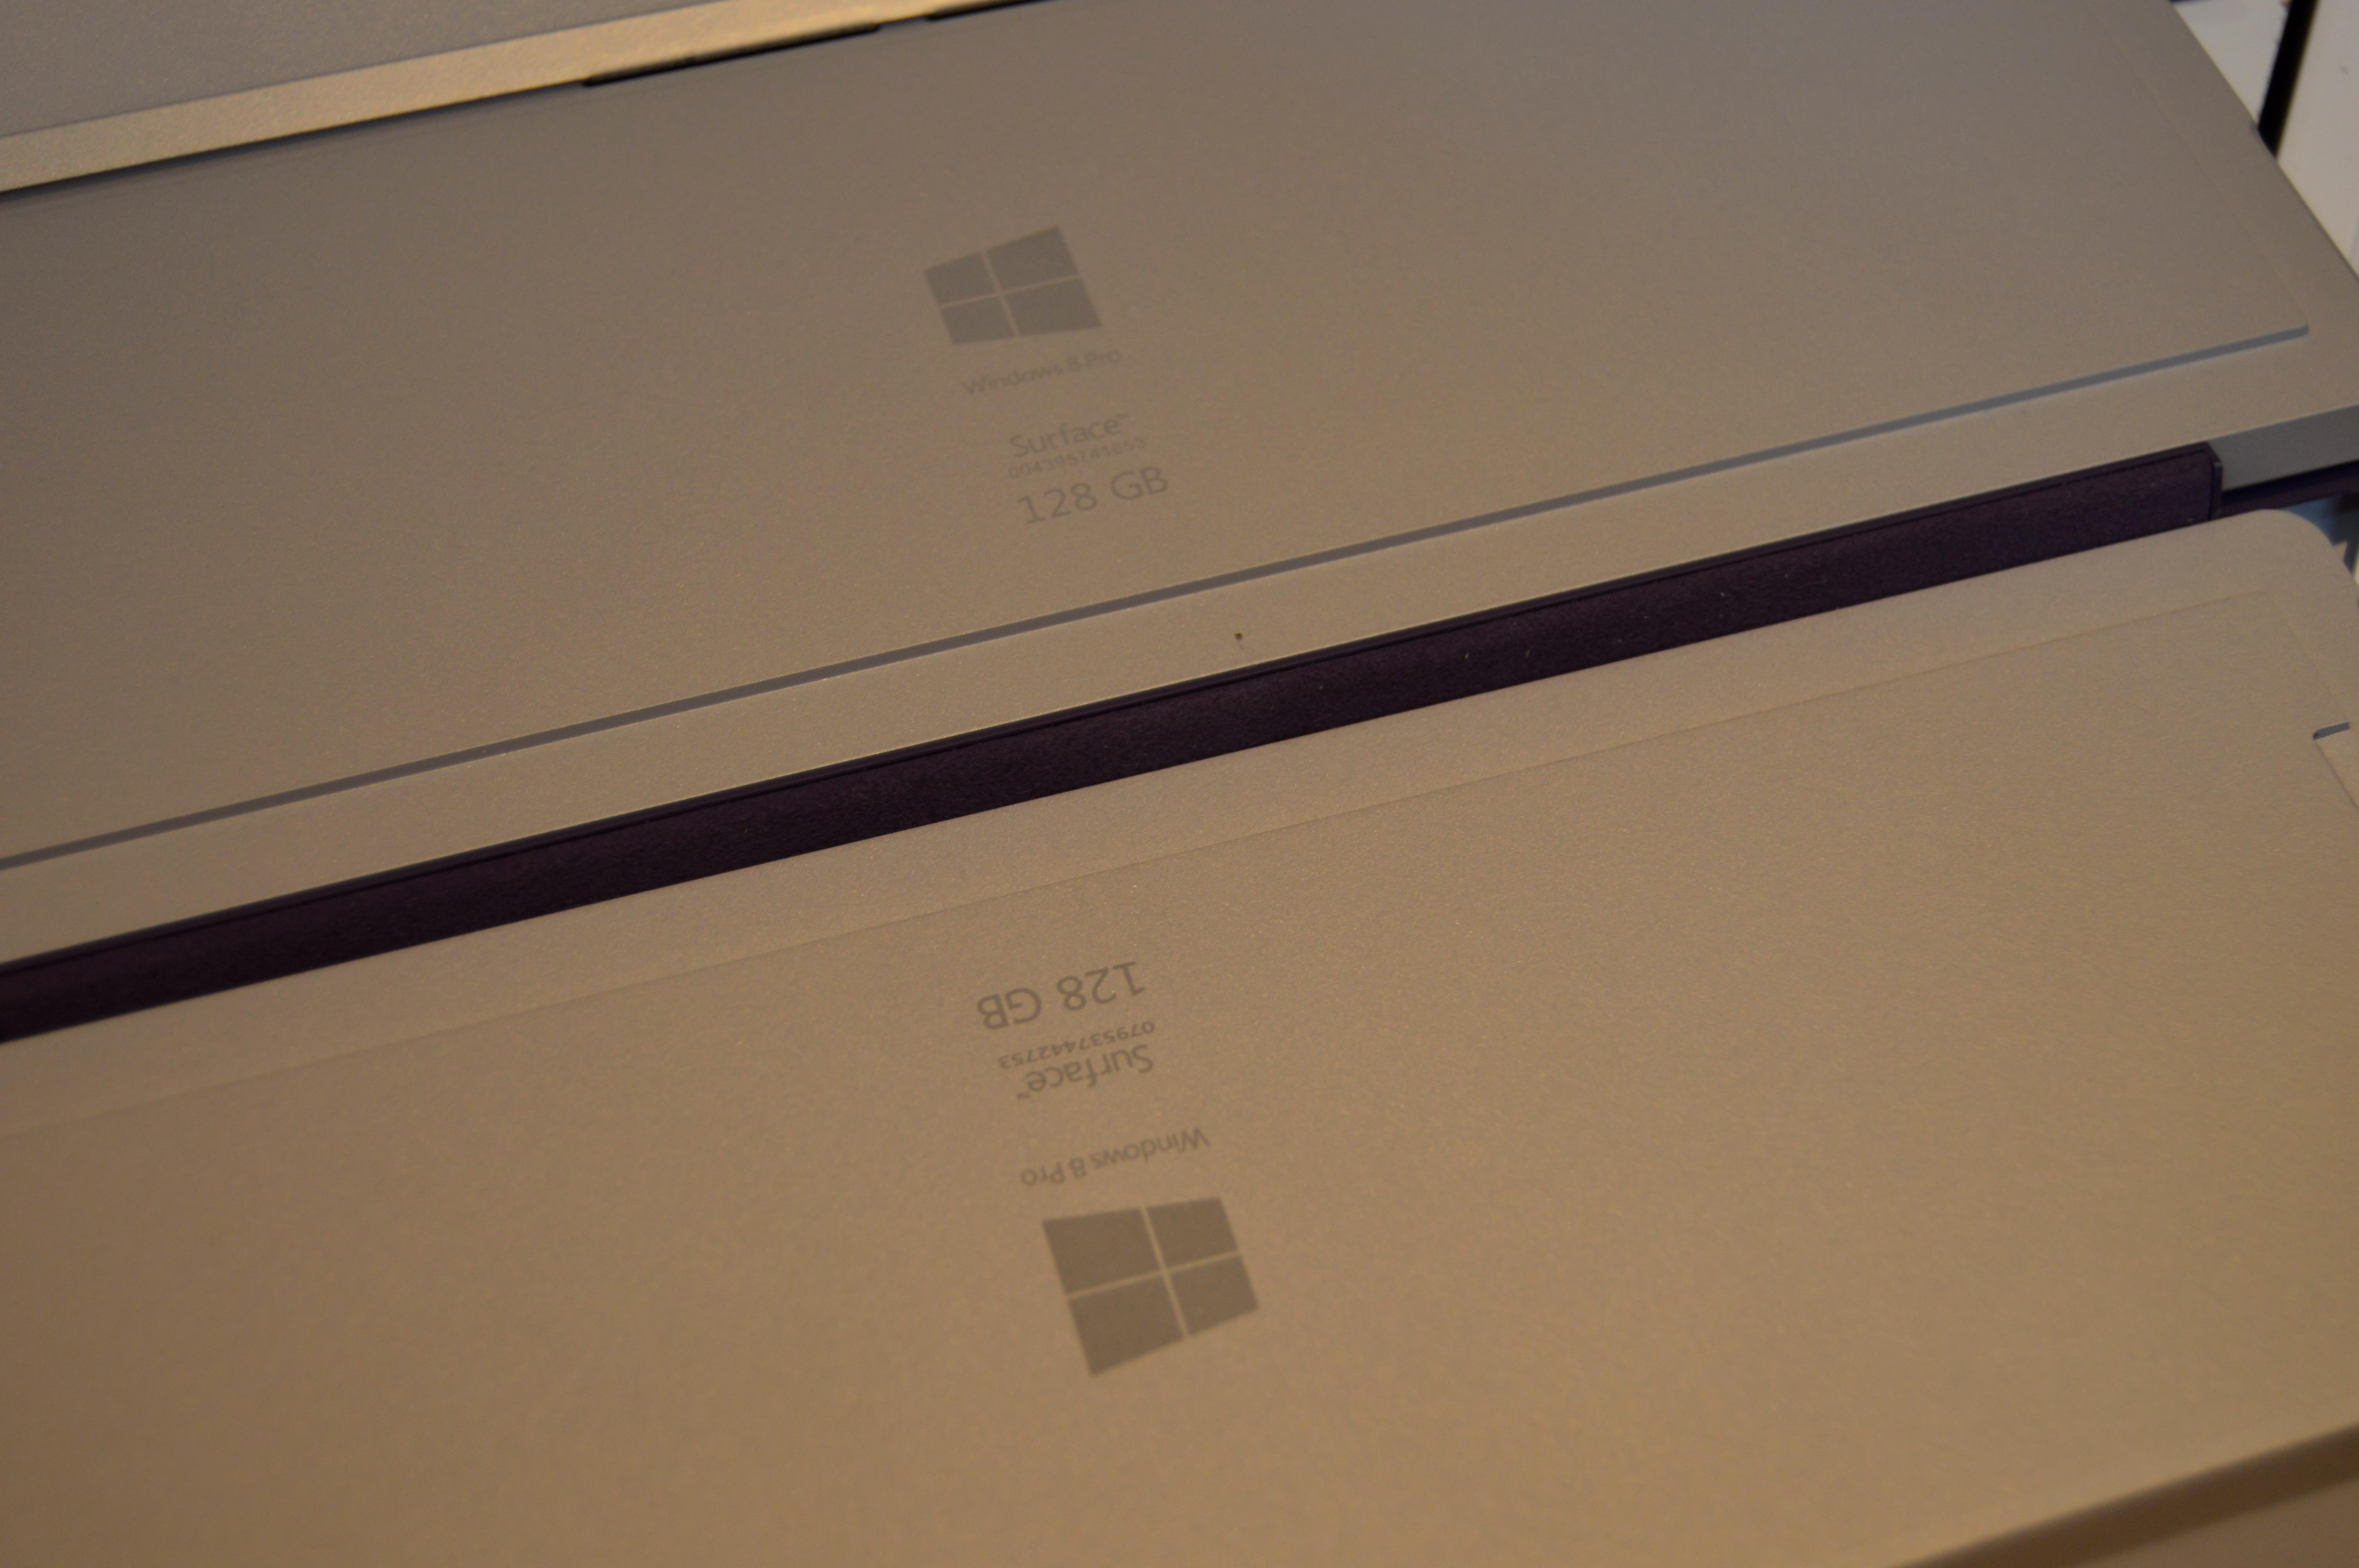 La Surface Pro 3, la excelencia de Microsoft